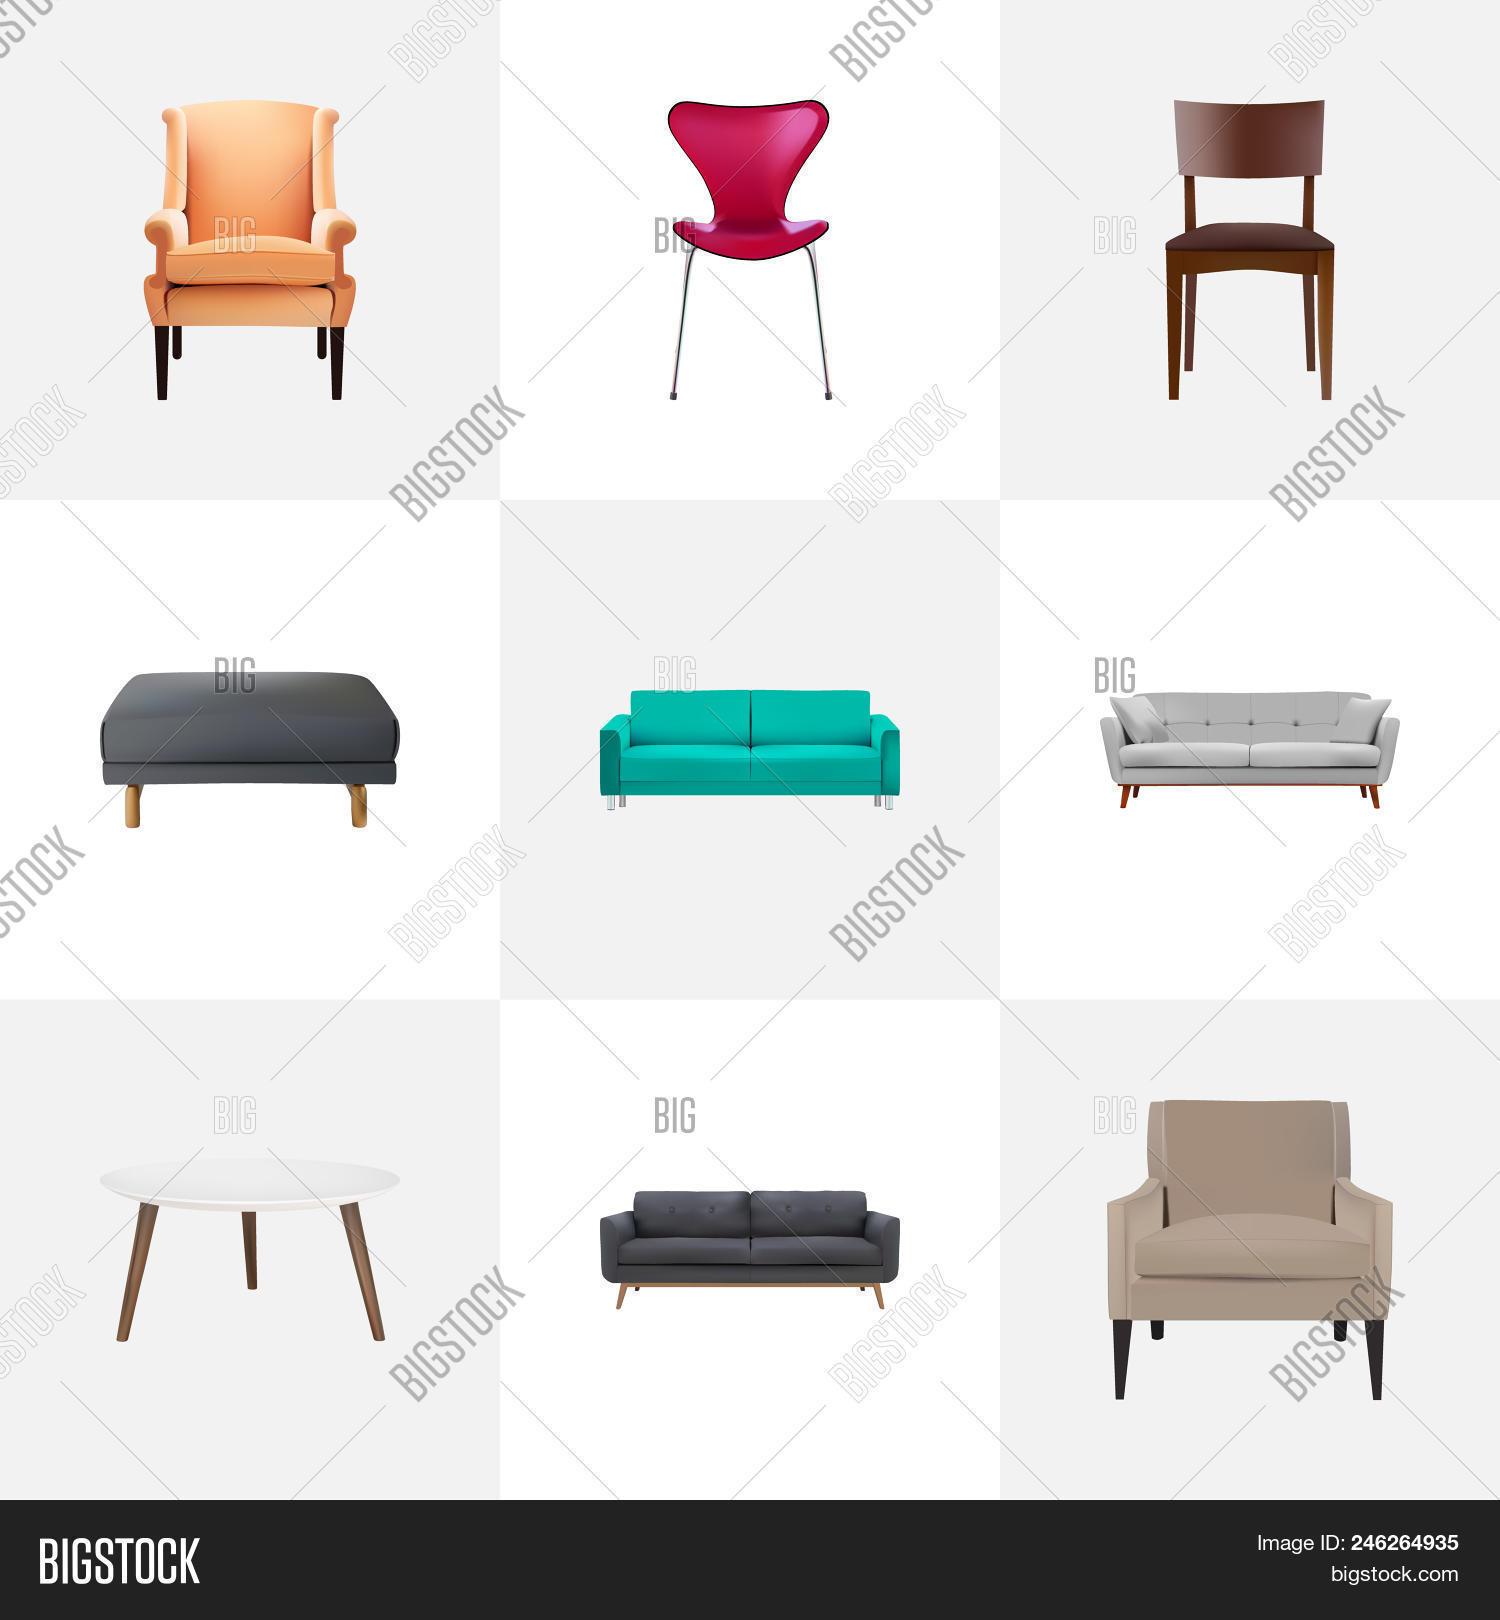 Cool Set Design Realistic Image Photo Free Trial Bigstock Cjindustries Chair Design For Home Cjindustriesco